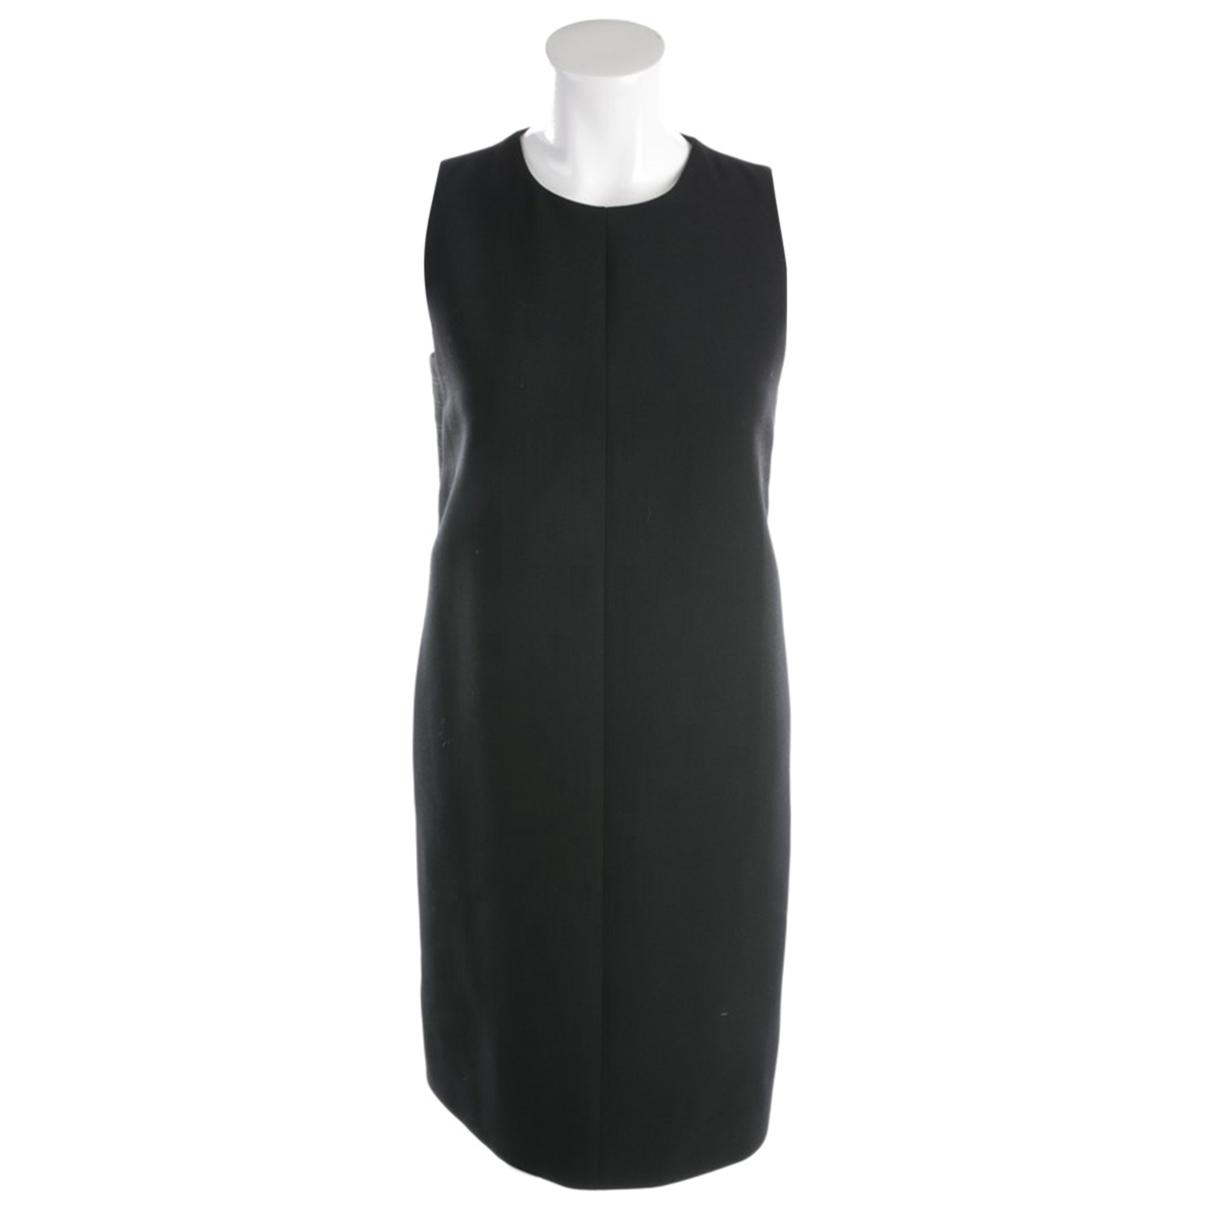 Victoria Beckham \N Black dress for Women 34 FR